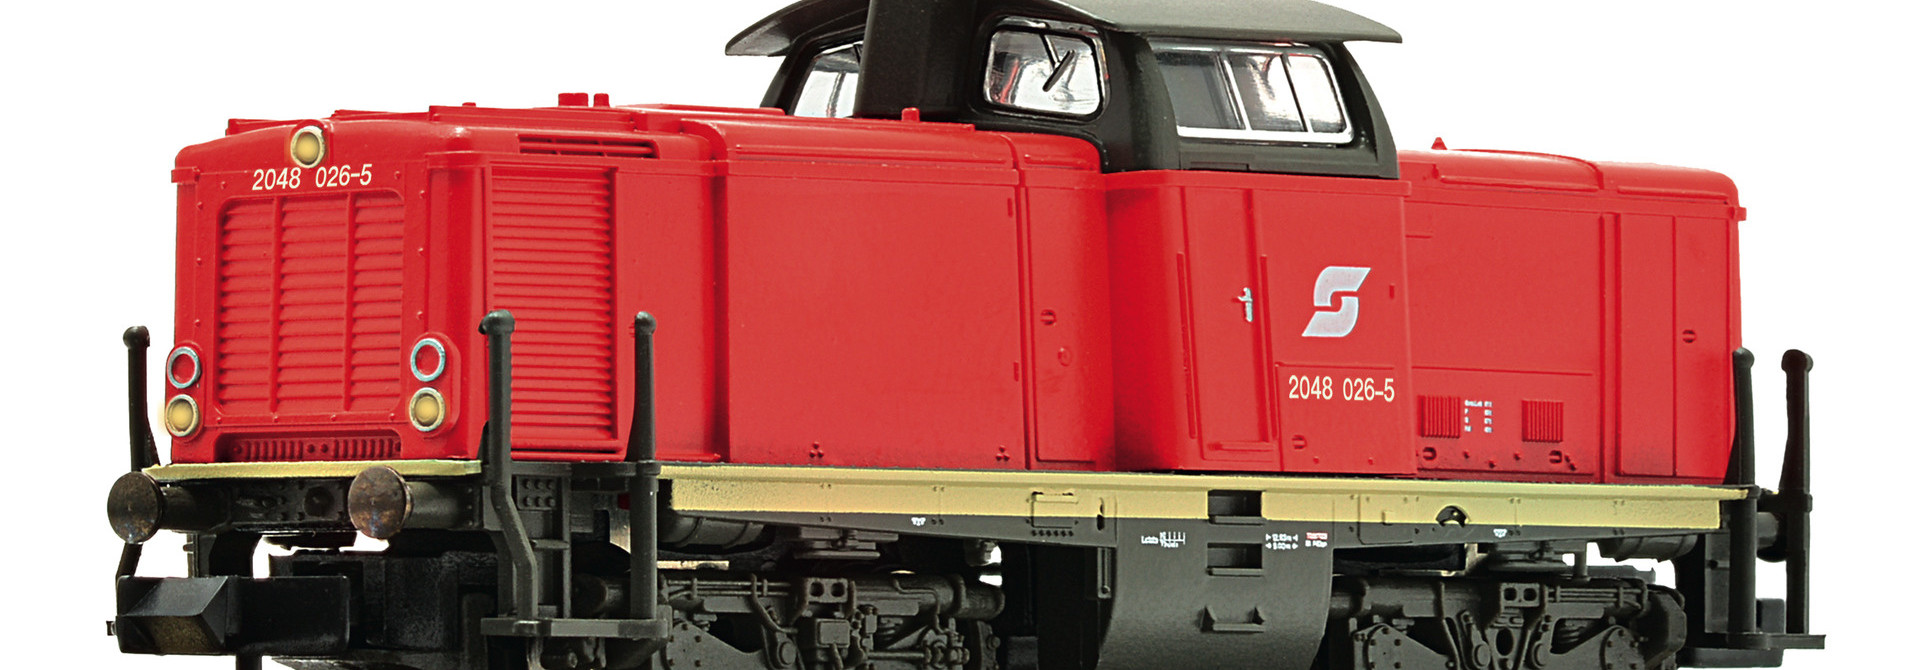 722887 Diesellok Rh 2048 ÖBB DCC